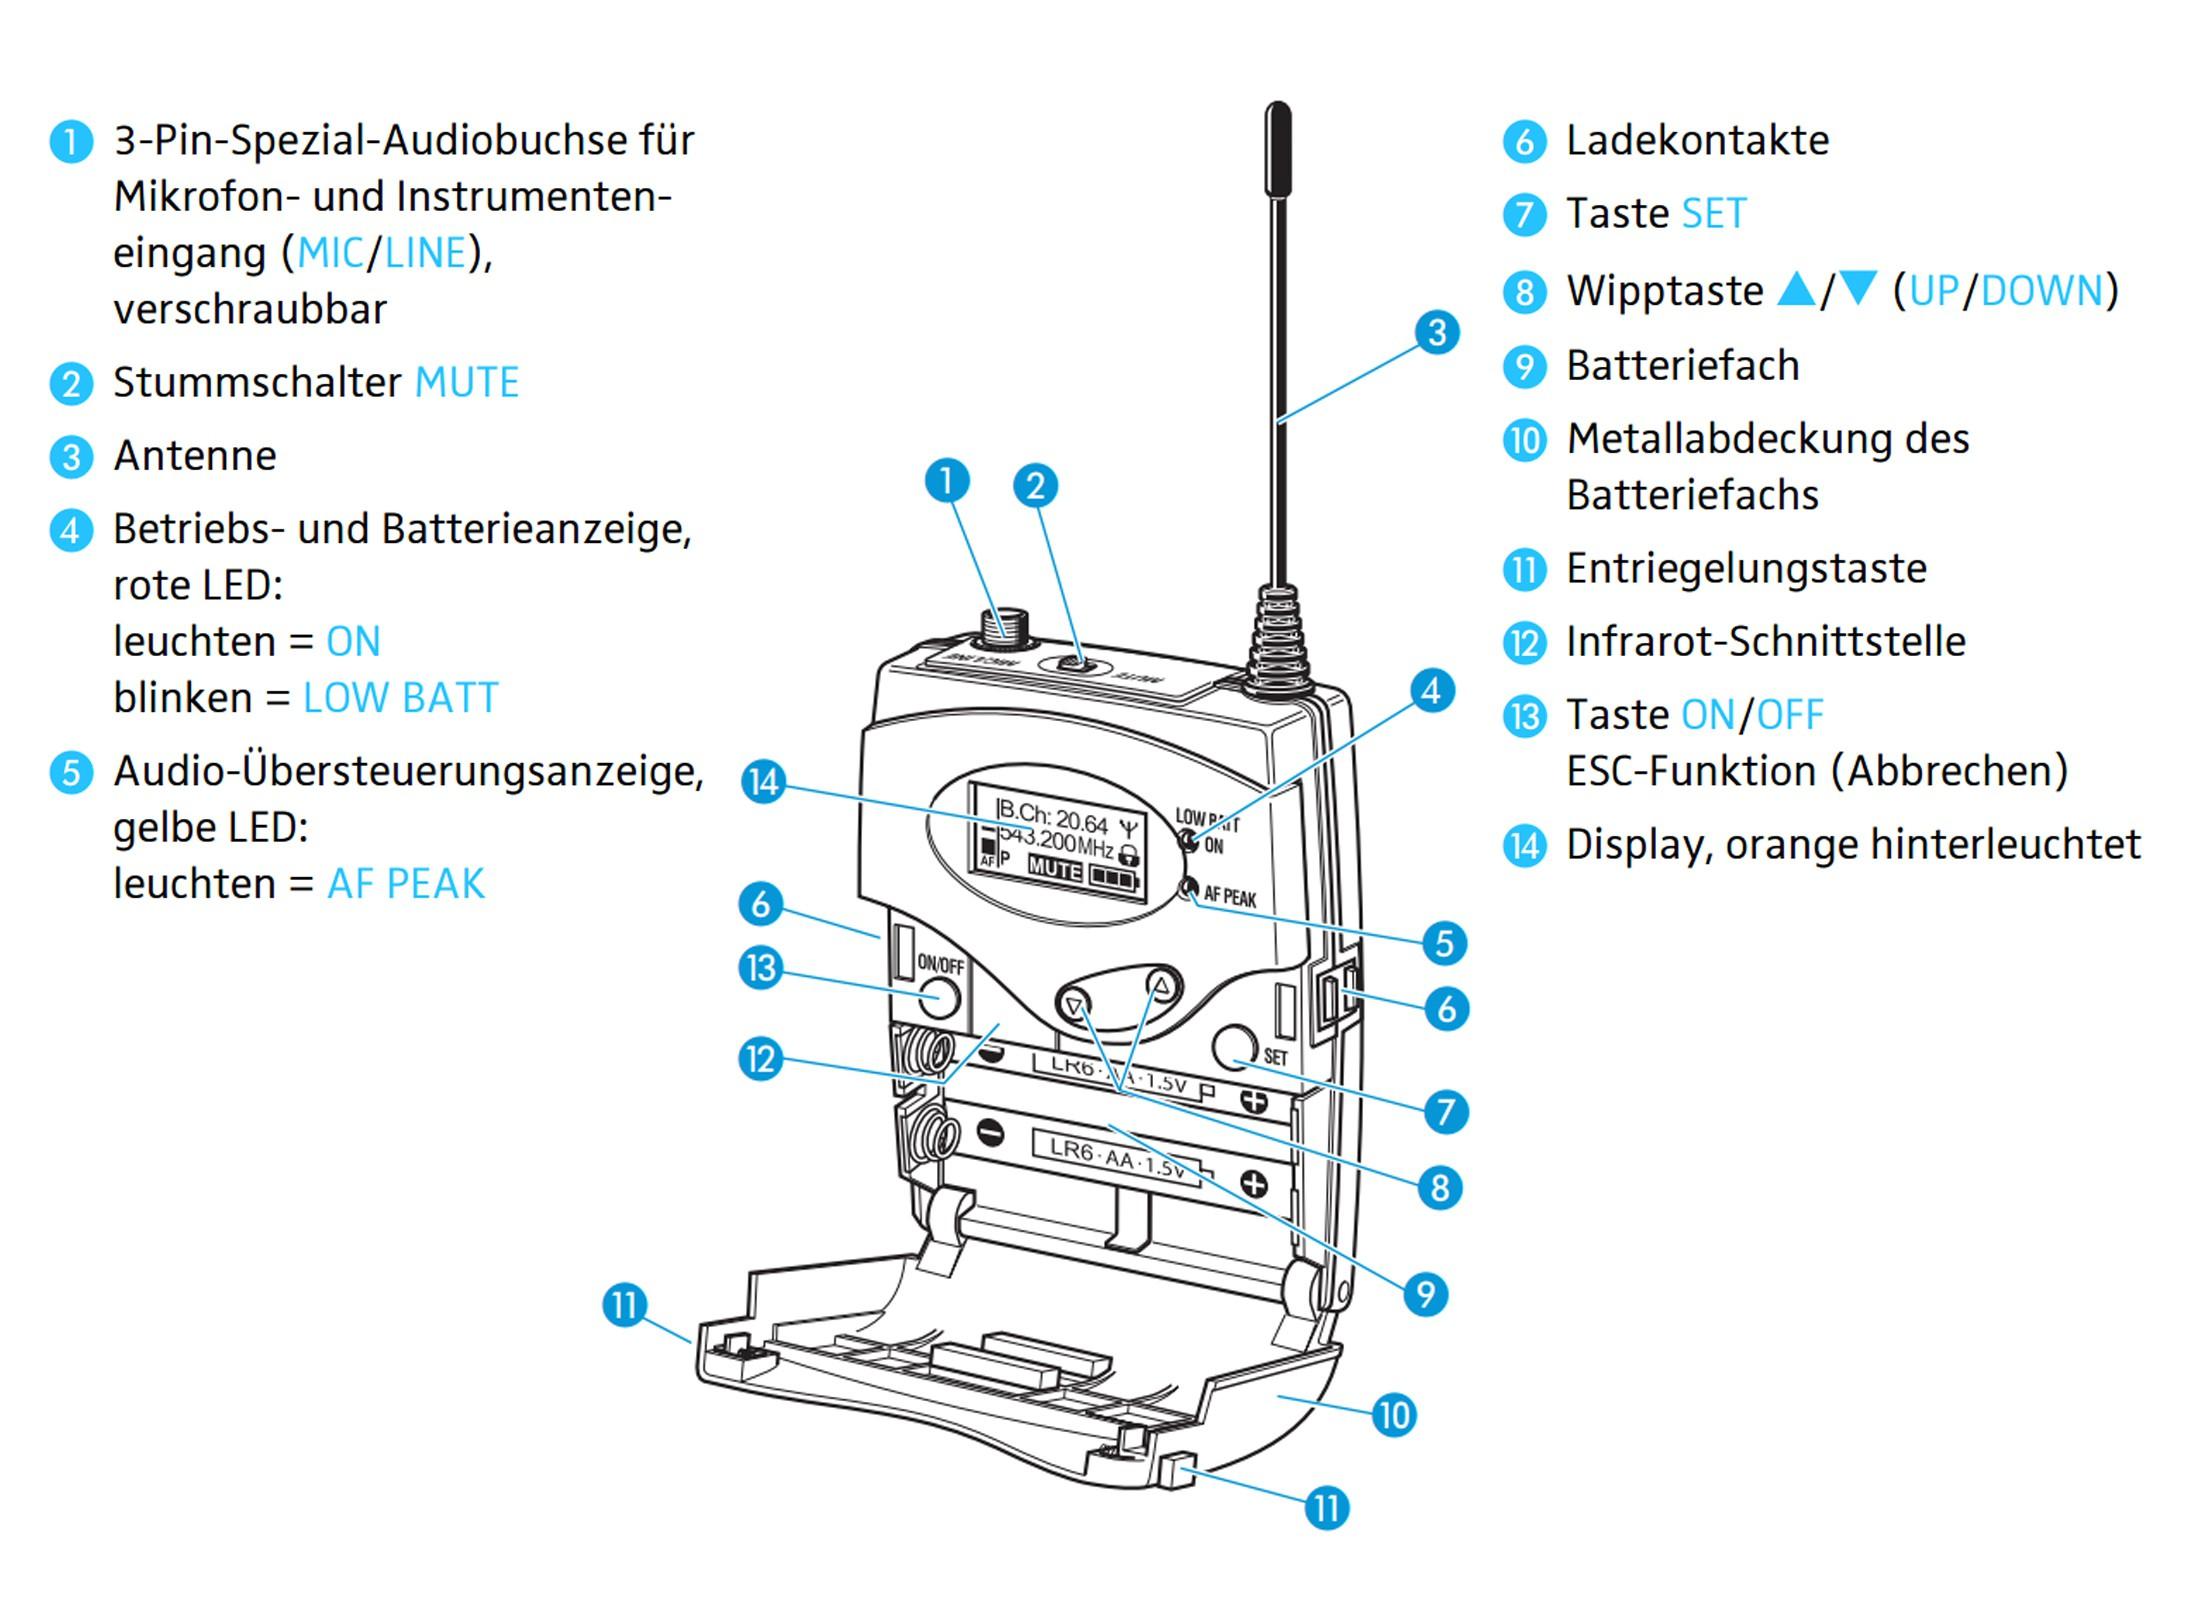 Sennheiser Wiring Diagram Schematic Diagrams Microphone G3 Online U2022 Circuit